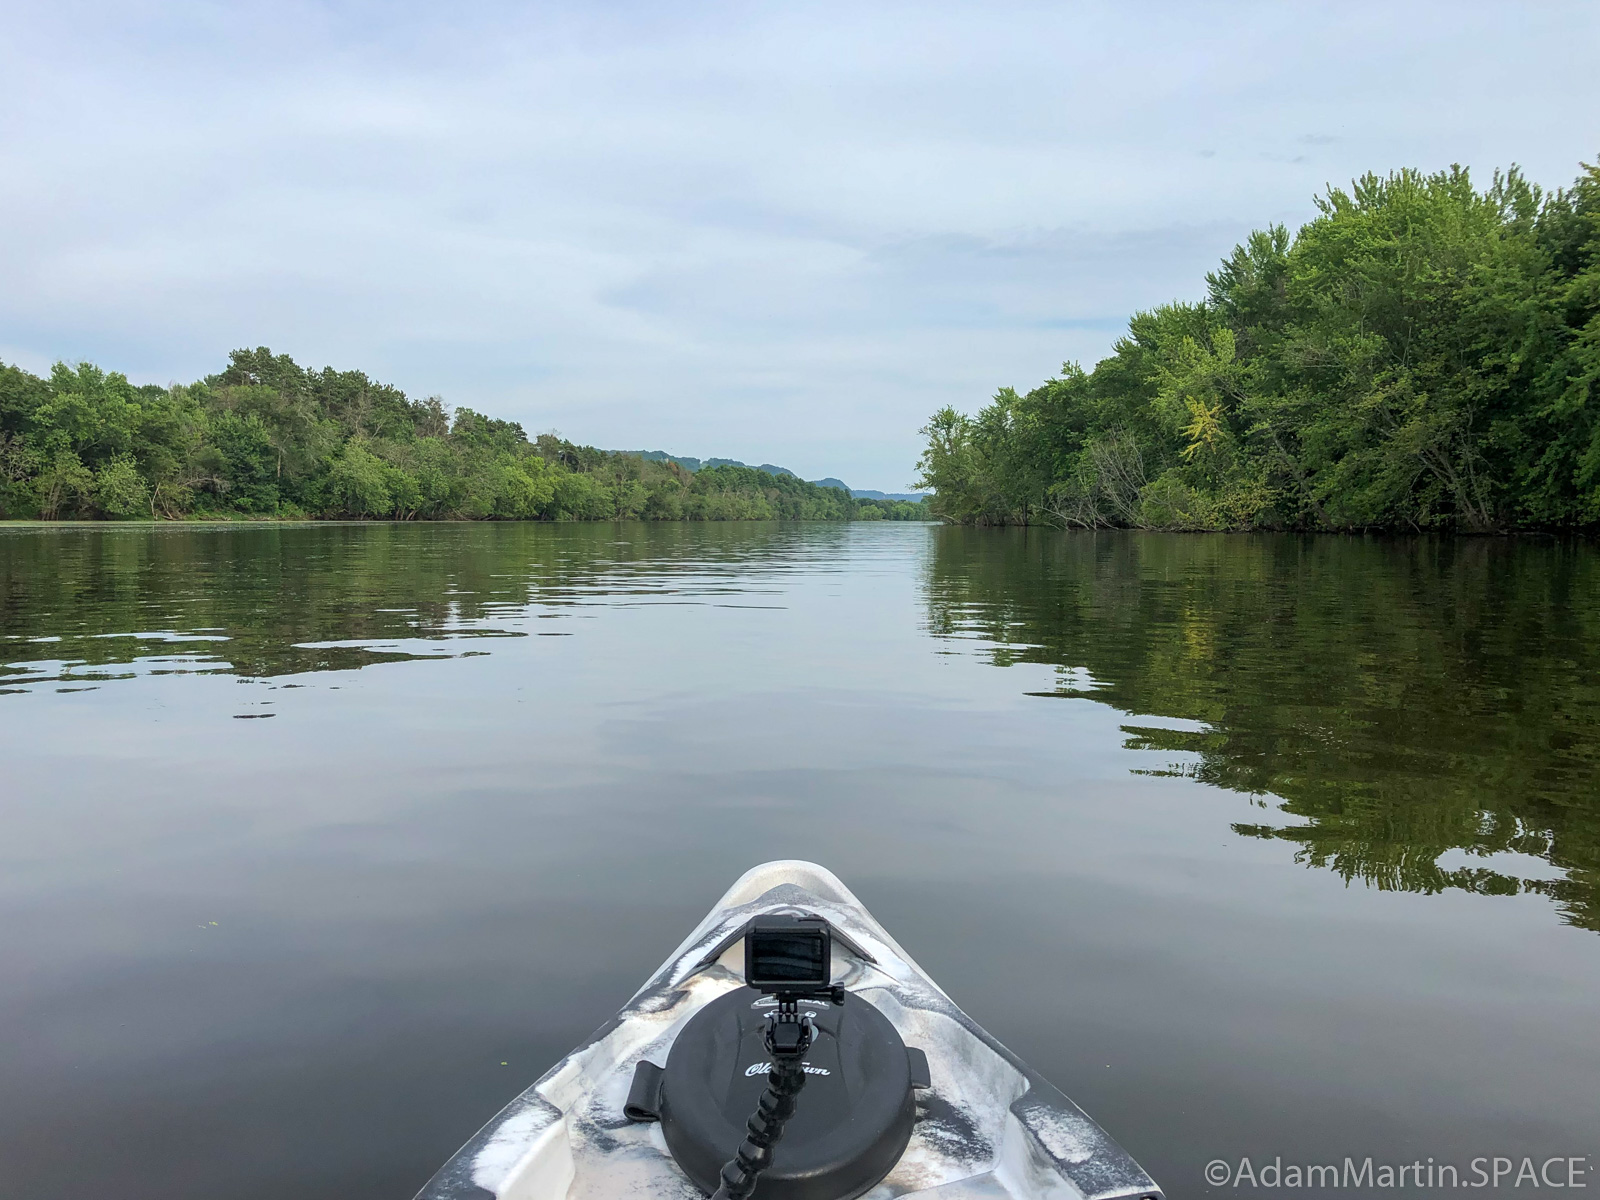 Merrick State Park - Paddling along Fountain City Bay